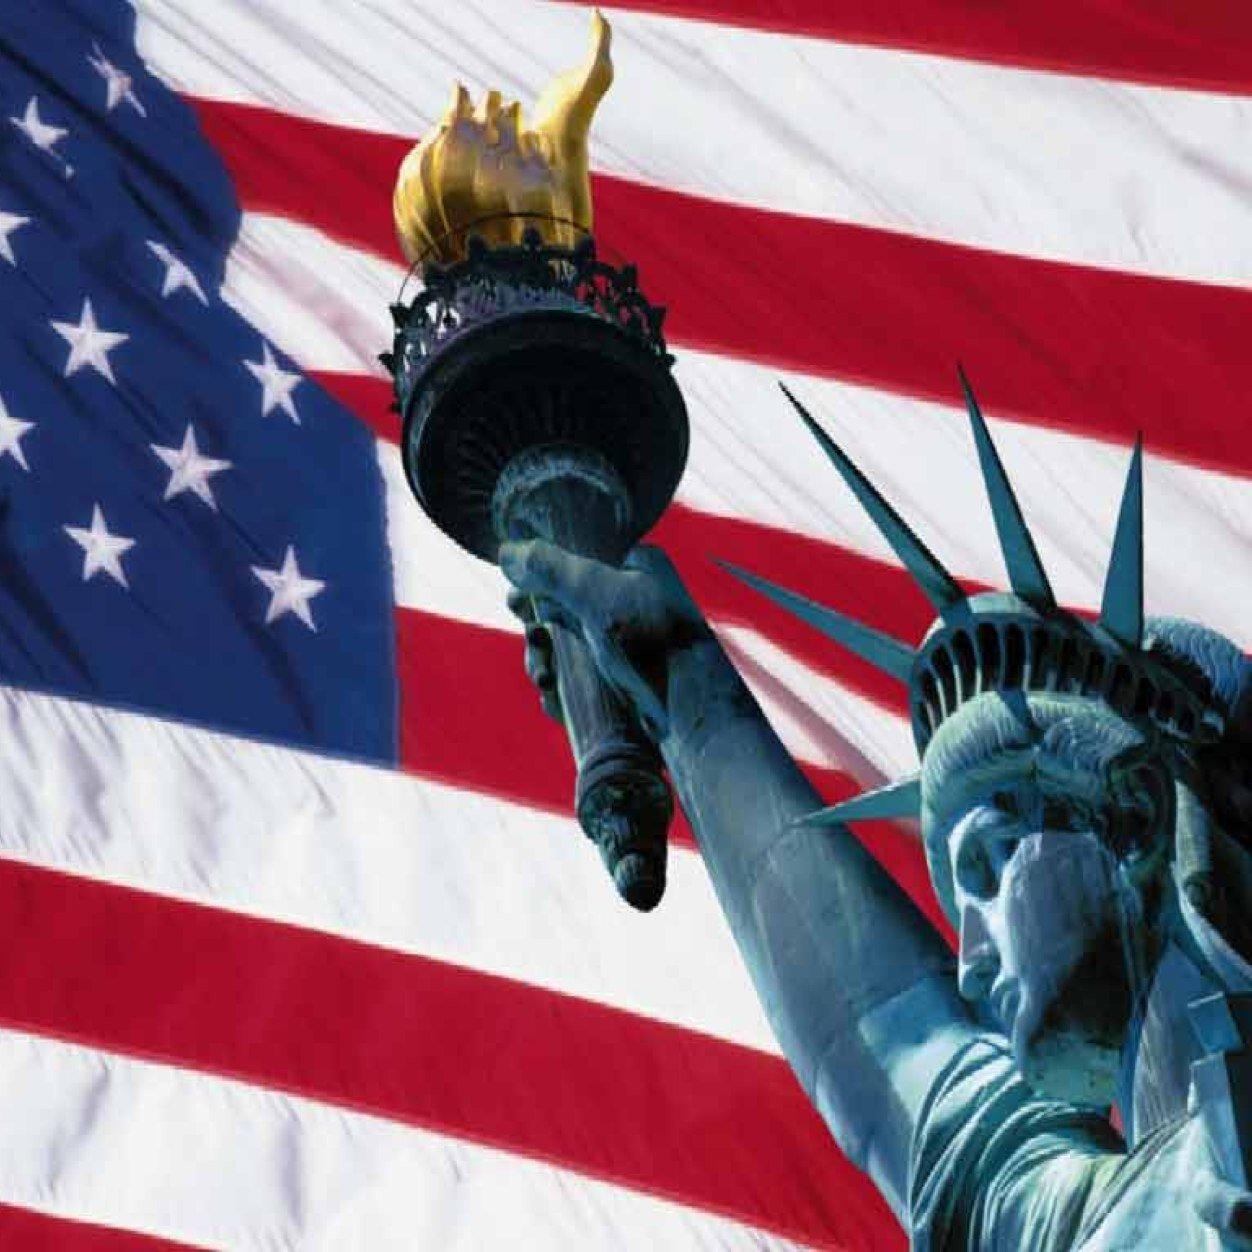 Blue Jeans targets U.S. with Ingram